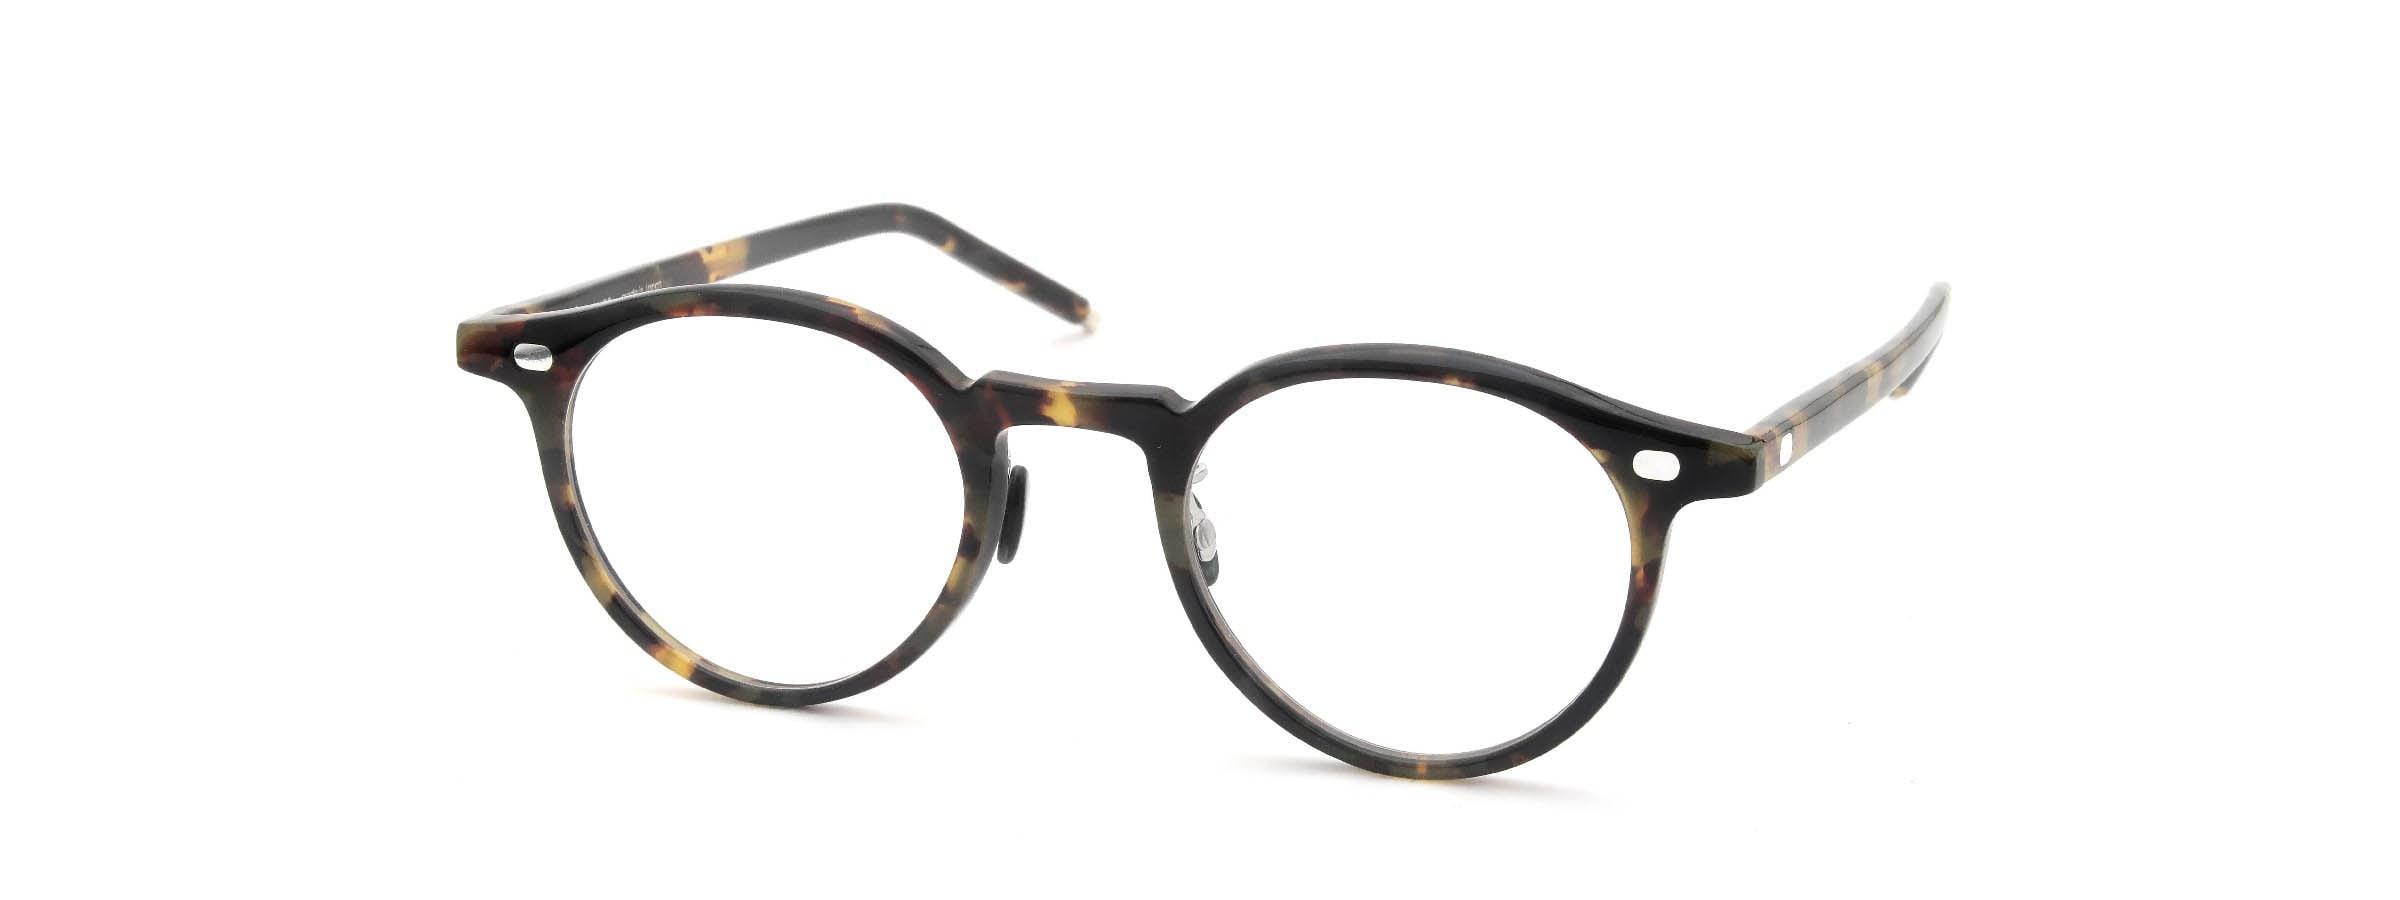 10 eyevan NO.3 Ⅲ 45size  c.1005S Havana全体像